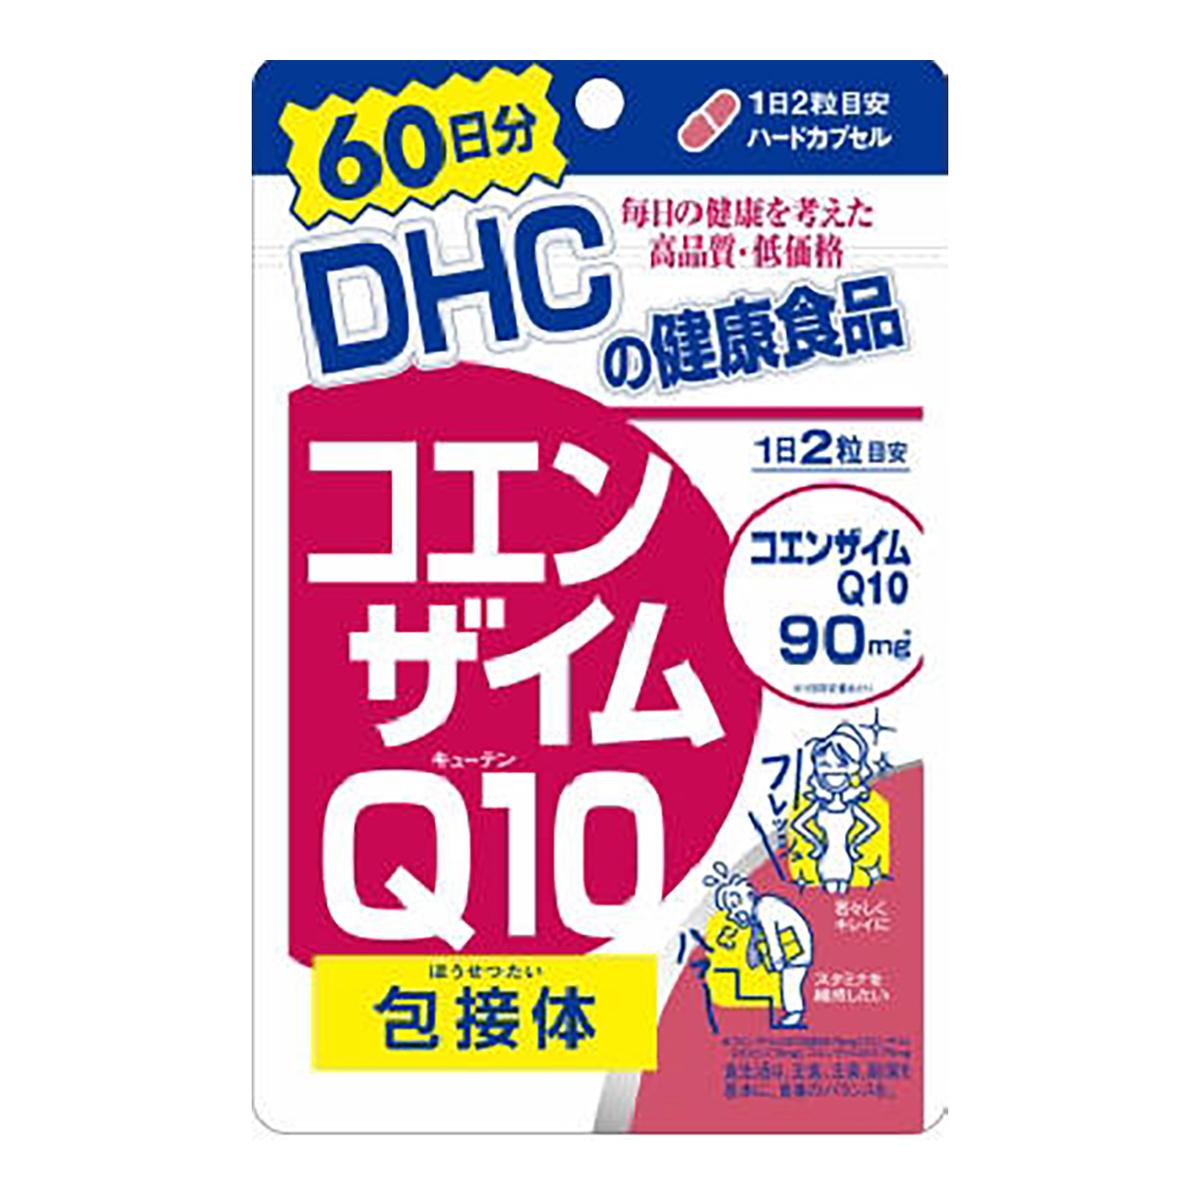 DHC コエンザイムQ10 バーゲンセール 包接体 60日分 吸収力約3倍のQ10包接体配合 持続力も さらにパワーアップ 1日2粒目安でコエンザイムQ10 4511413403723 120粒 ハードカプセルタイプ DHC人気37位 90mg コエンザイムQ10包接体60日分 サプリメント 豪華な